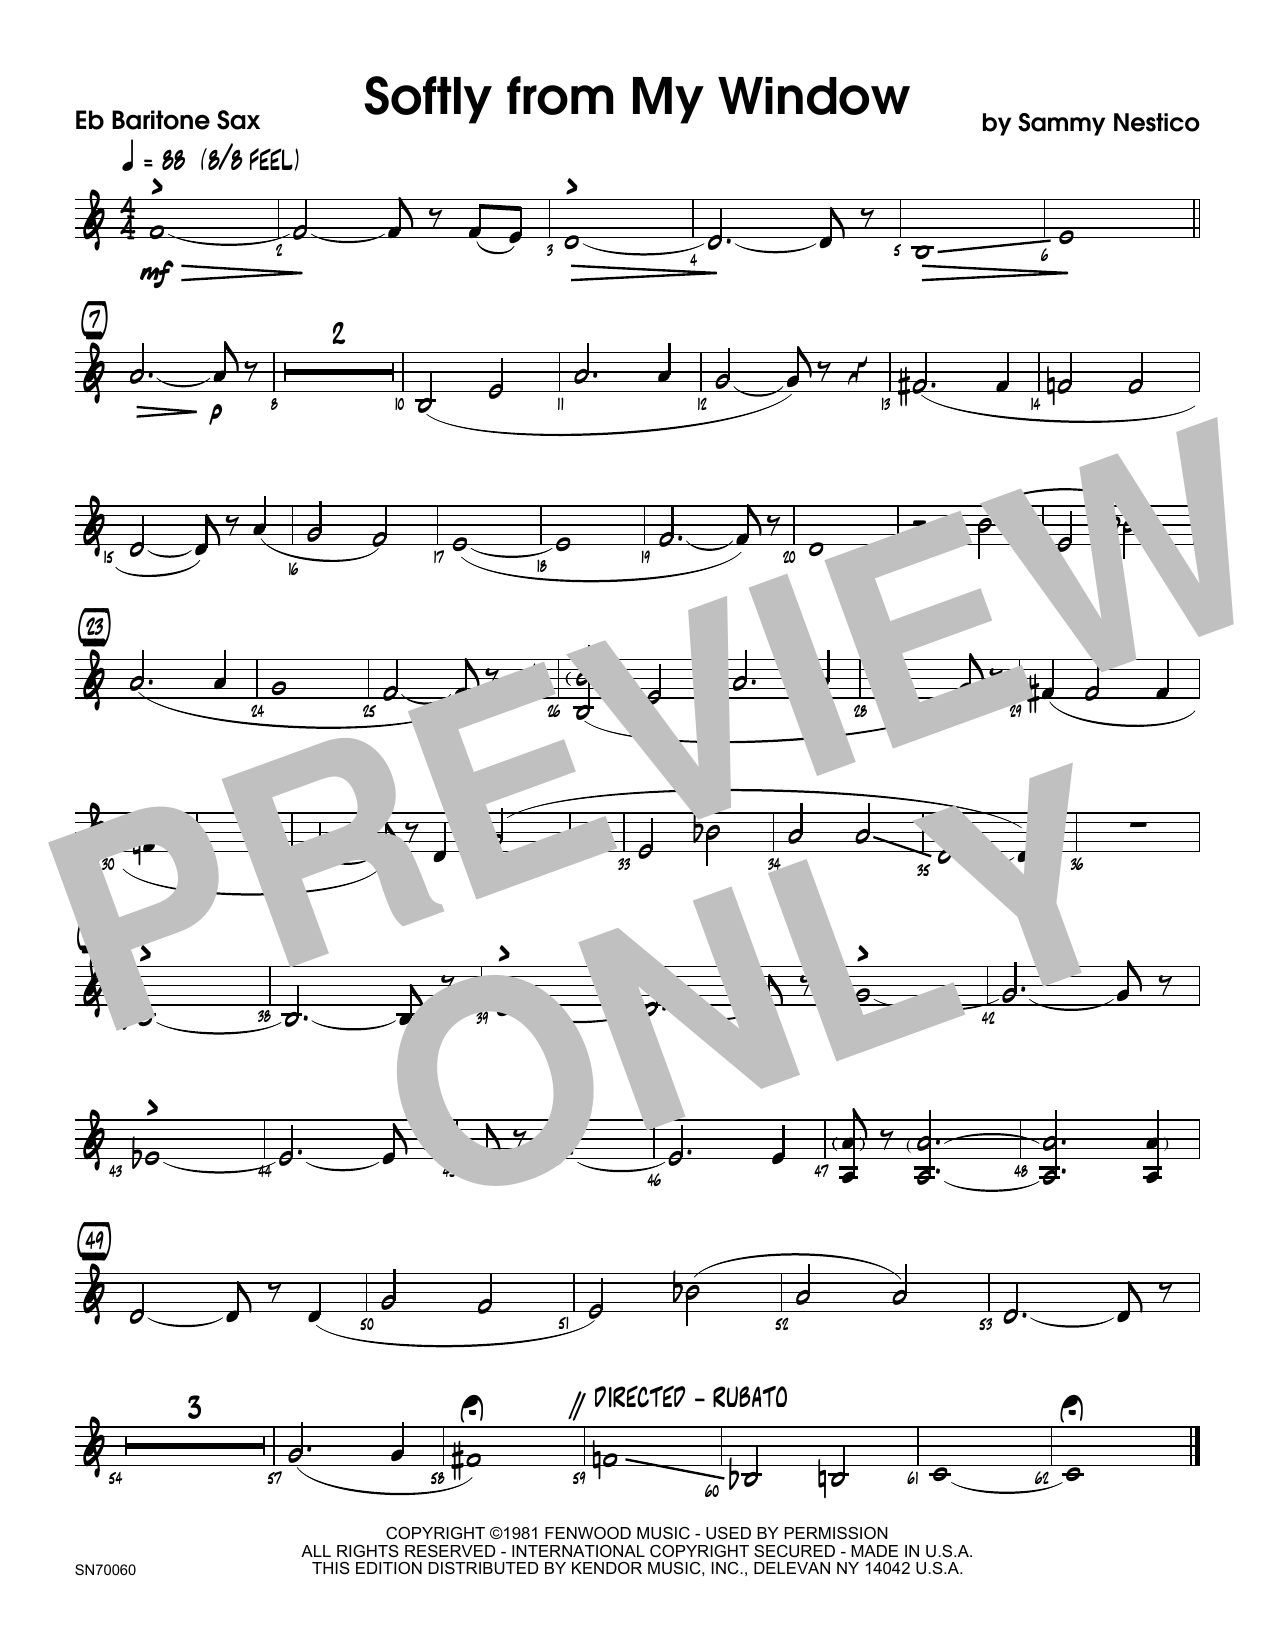 Softly From My Window - Eb Baritone Saxophone Sheet Music